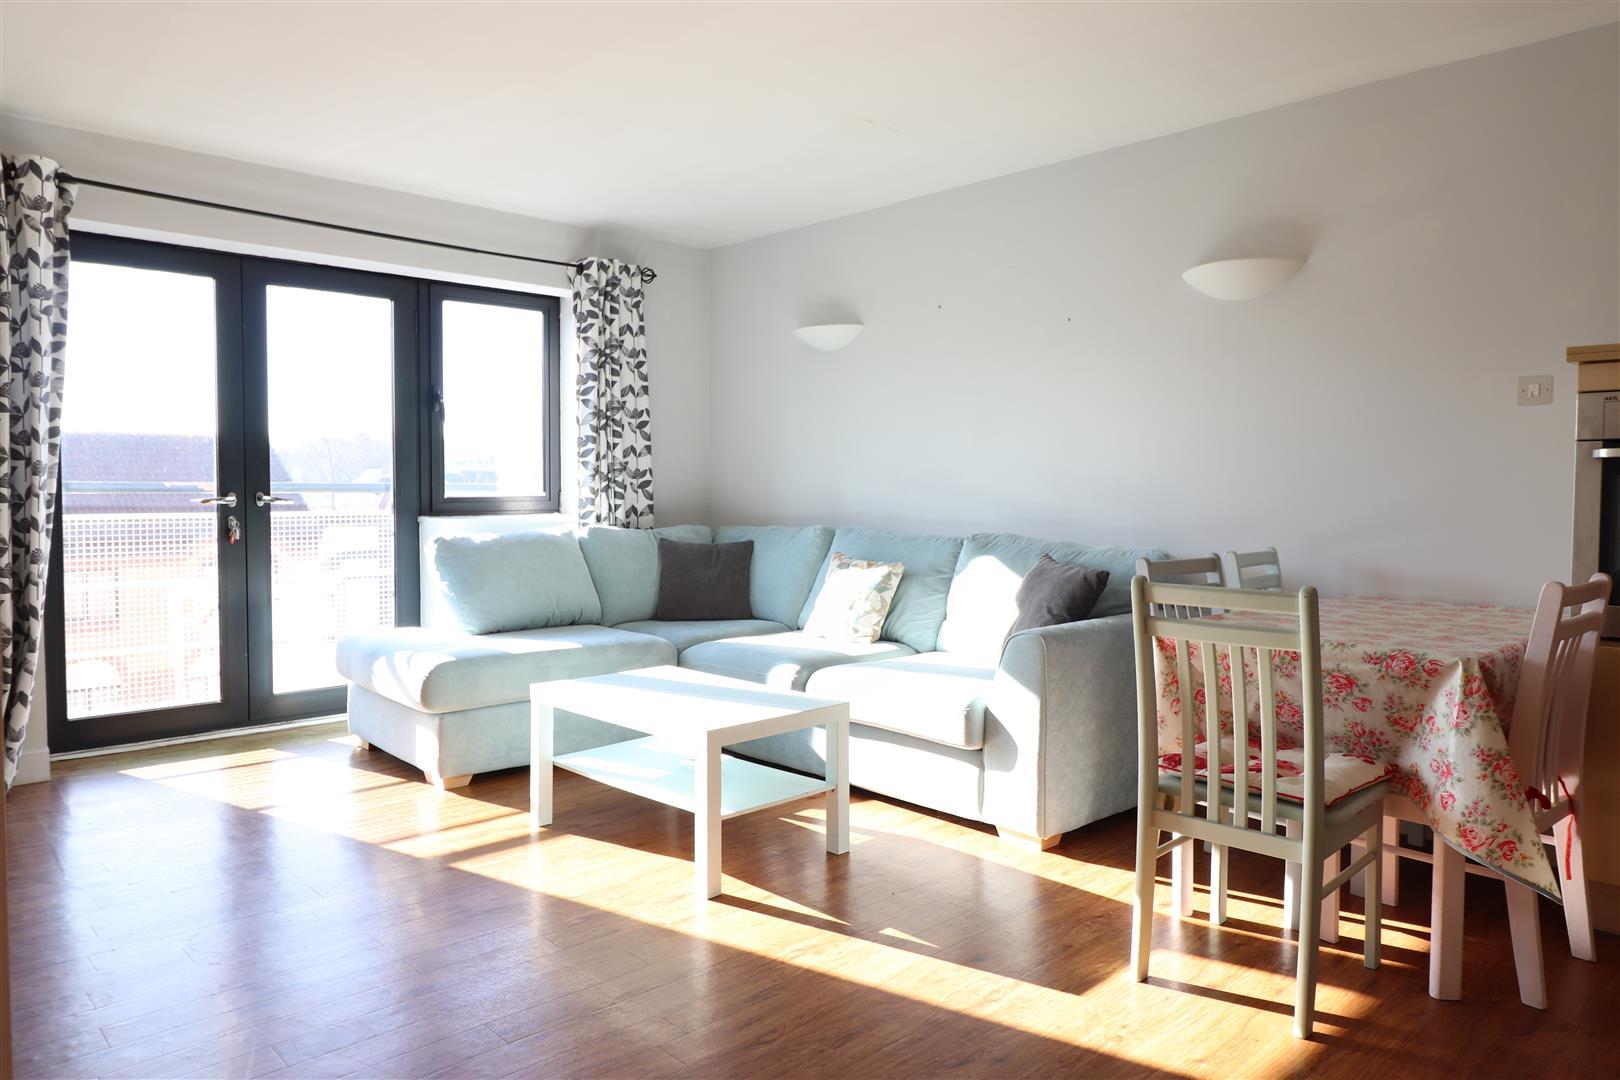 1 bedroom apartment for sale in birmingham - One bedroom apartments birmingham al ...